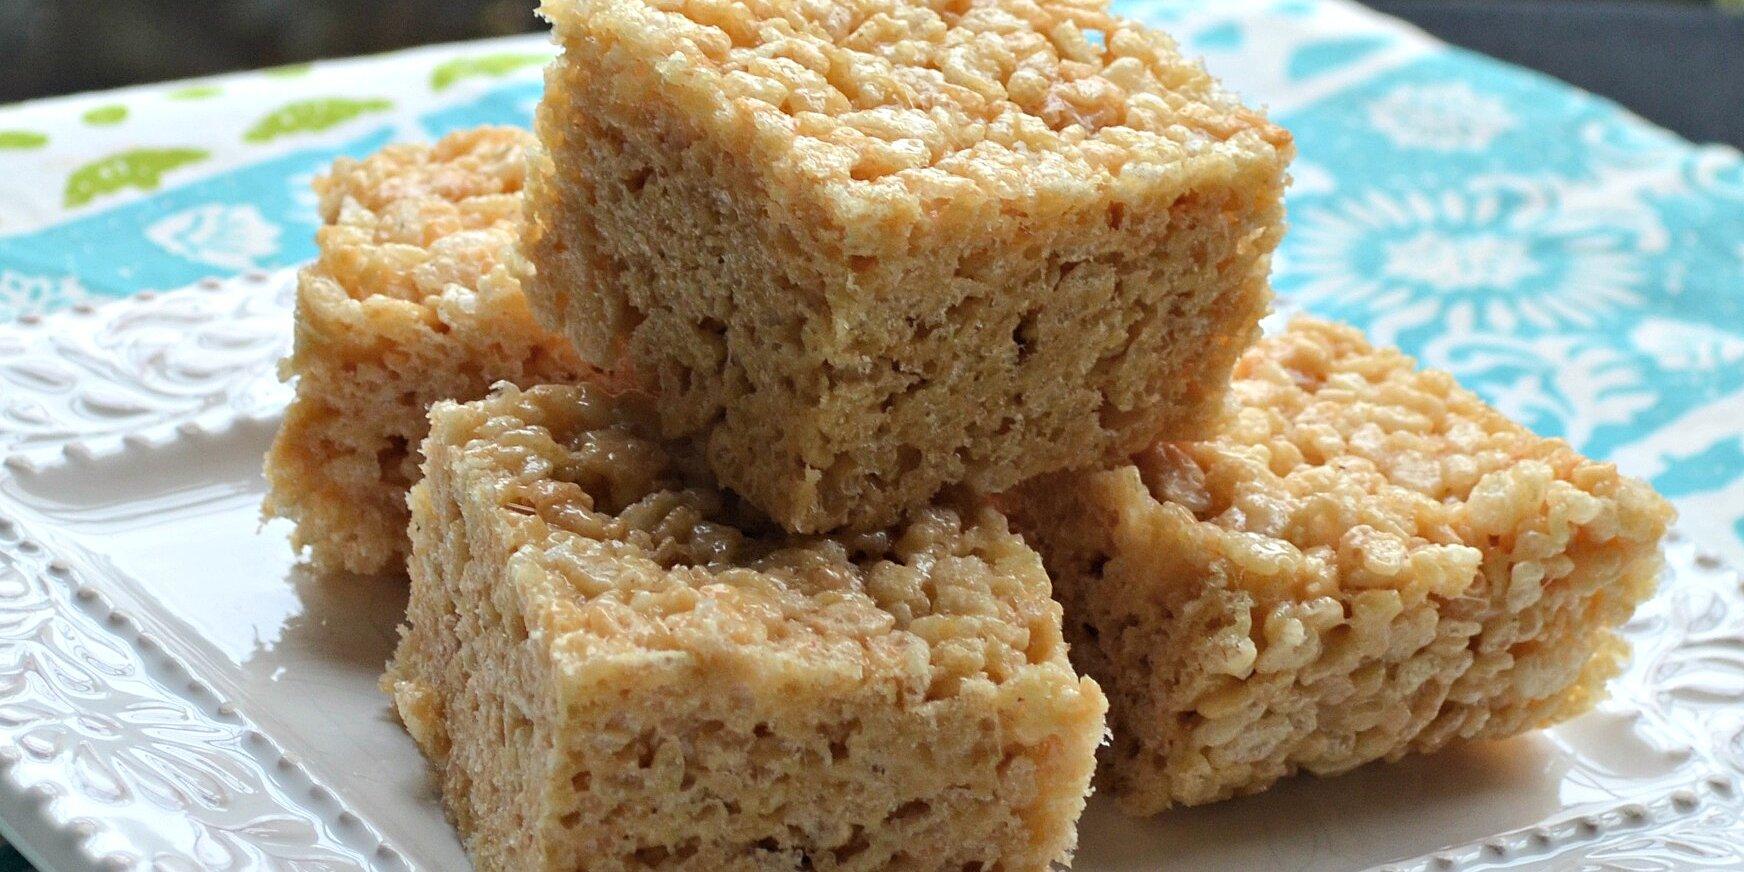 salted caramel marshmallow crispy treats gluten free recipe